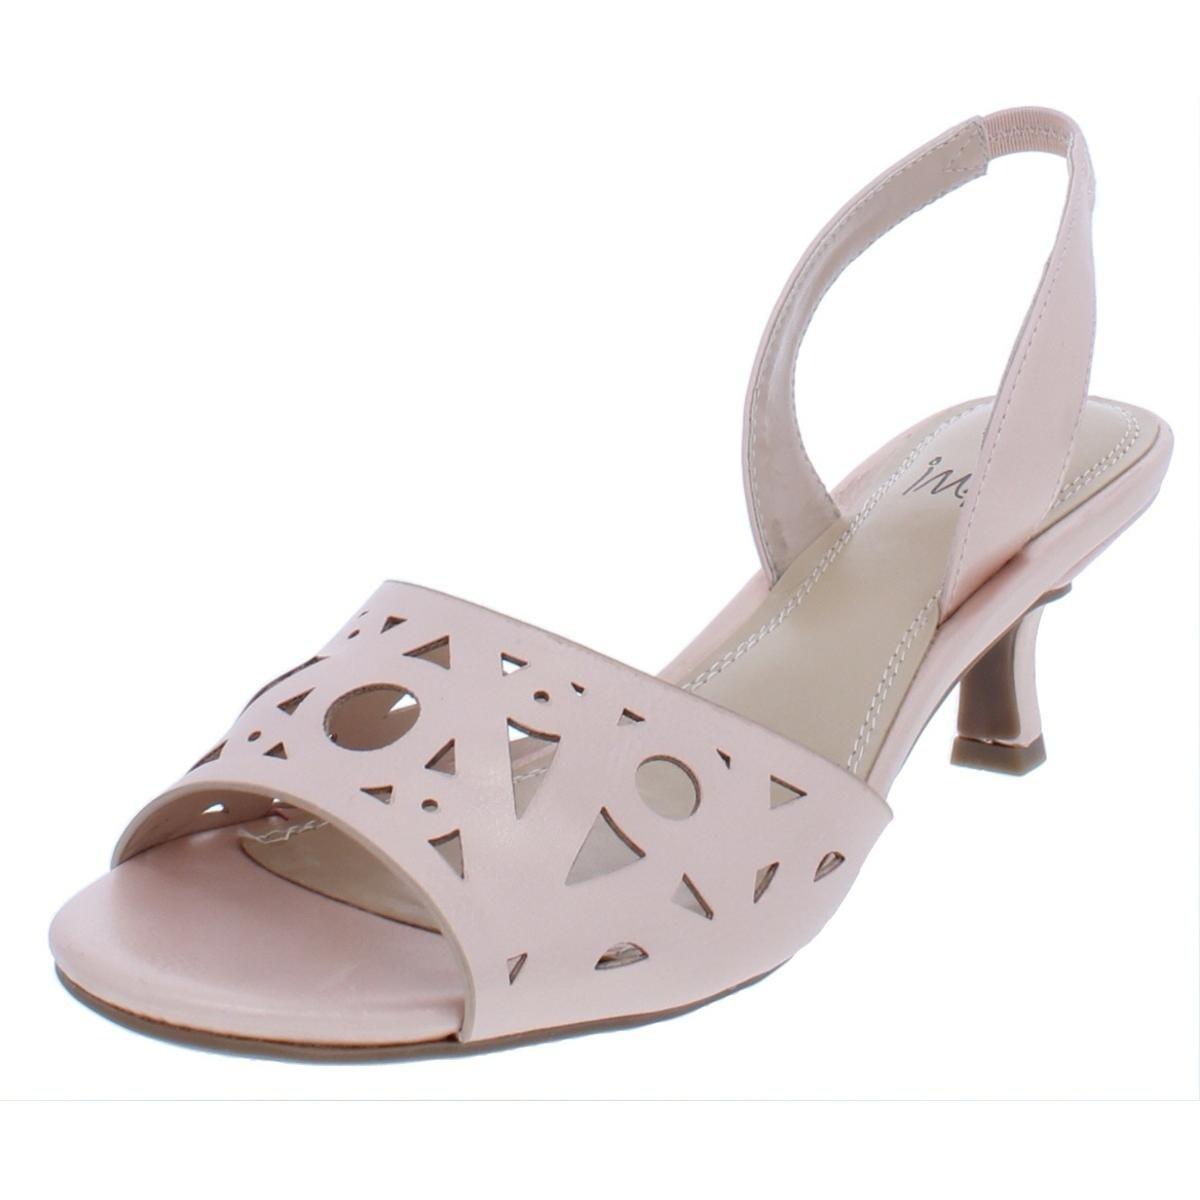 a90eaa8bd07 Shop Impo International Womens Eloi Slingback Sandals Faux Leather  Slingback - 6.5 Medium (B